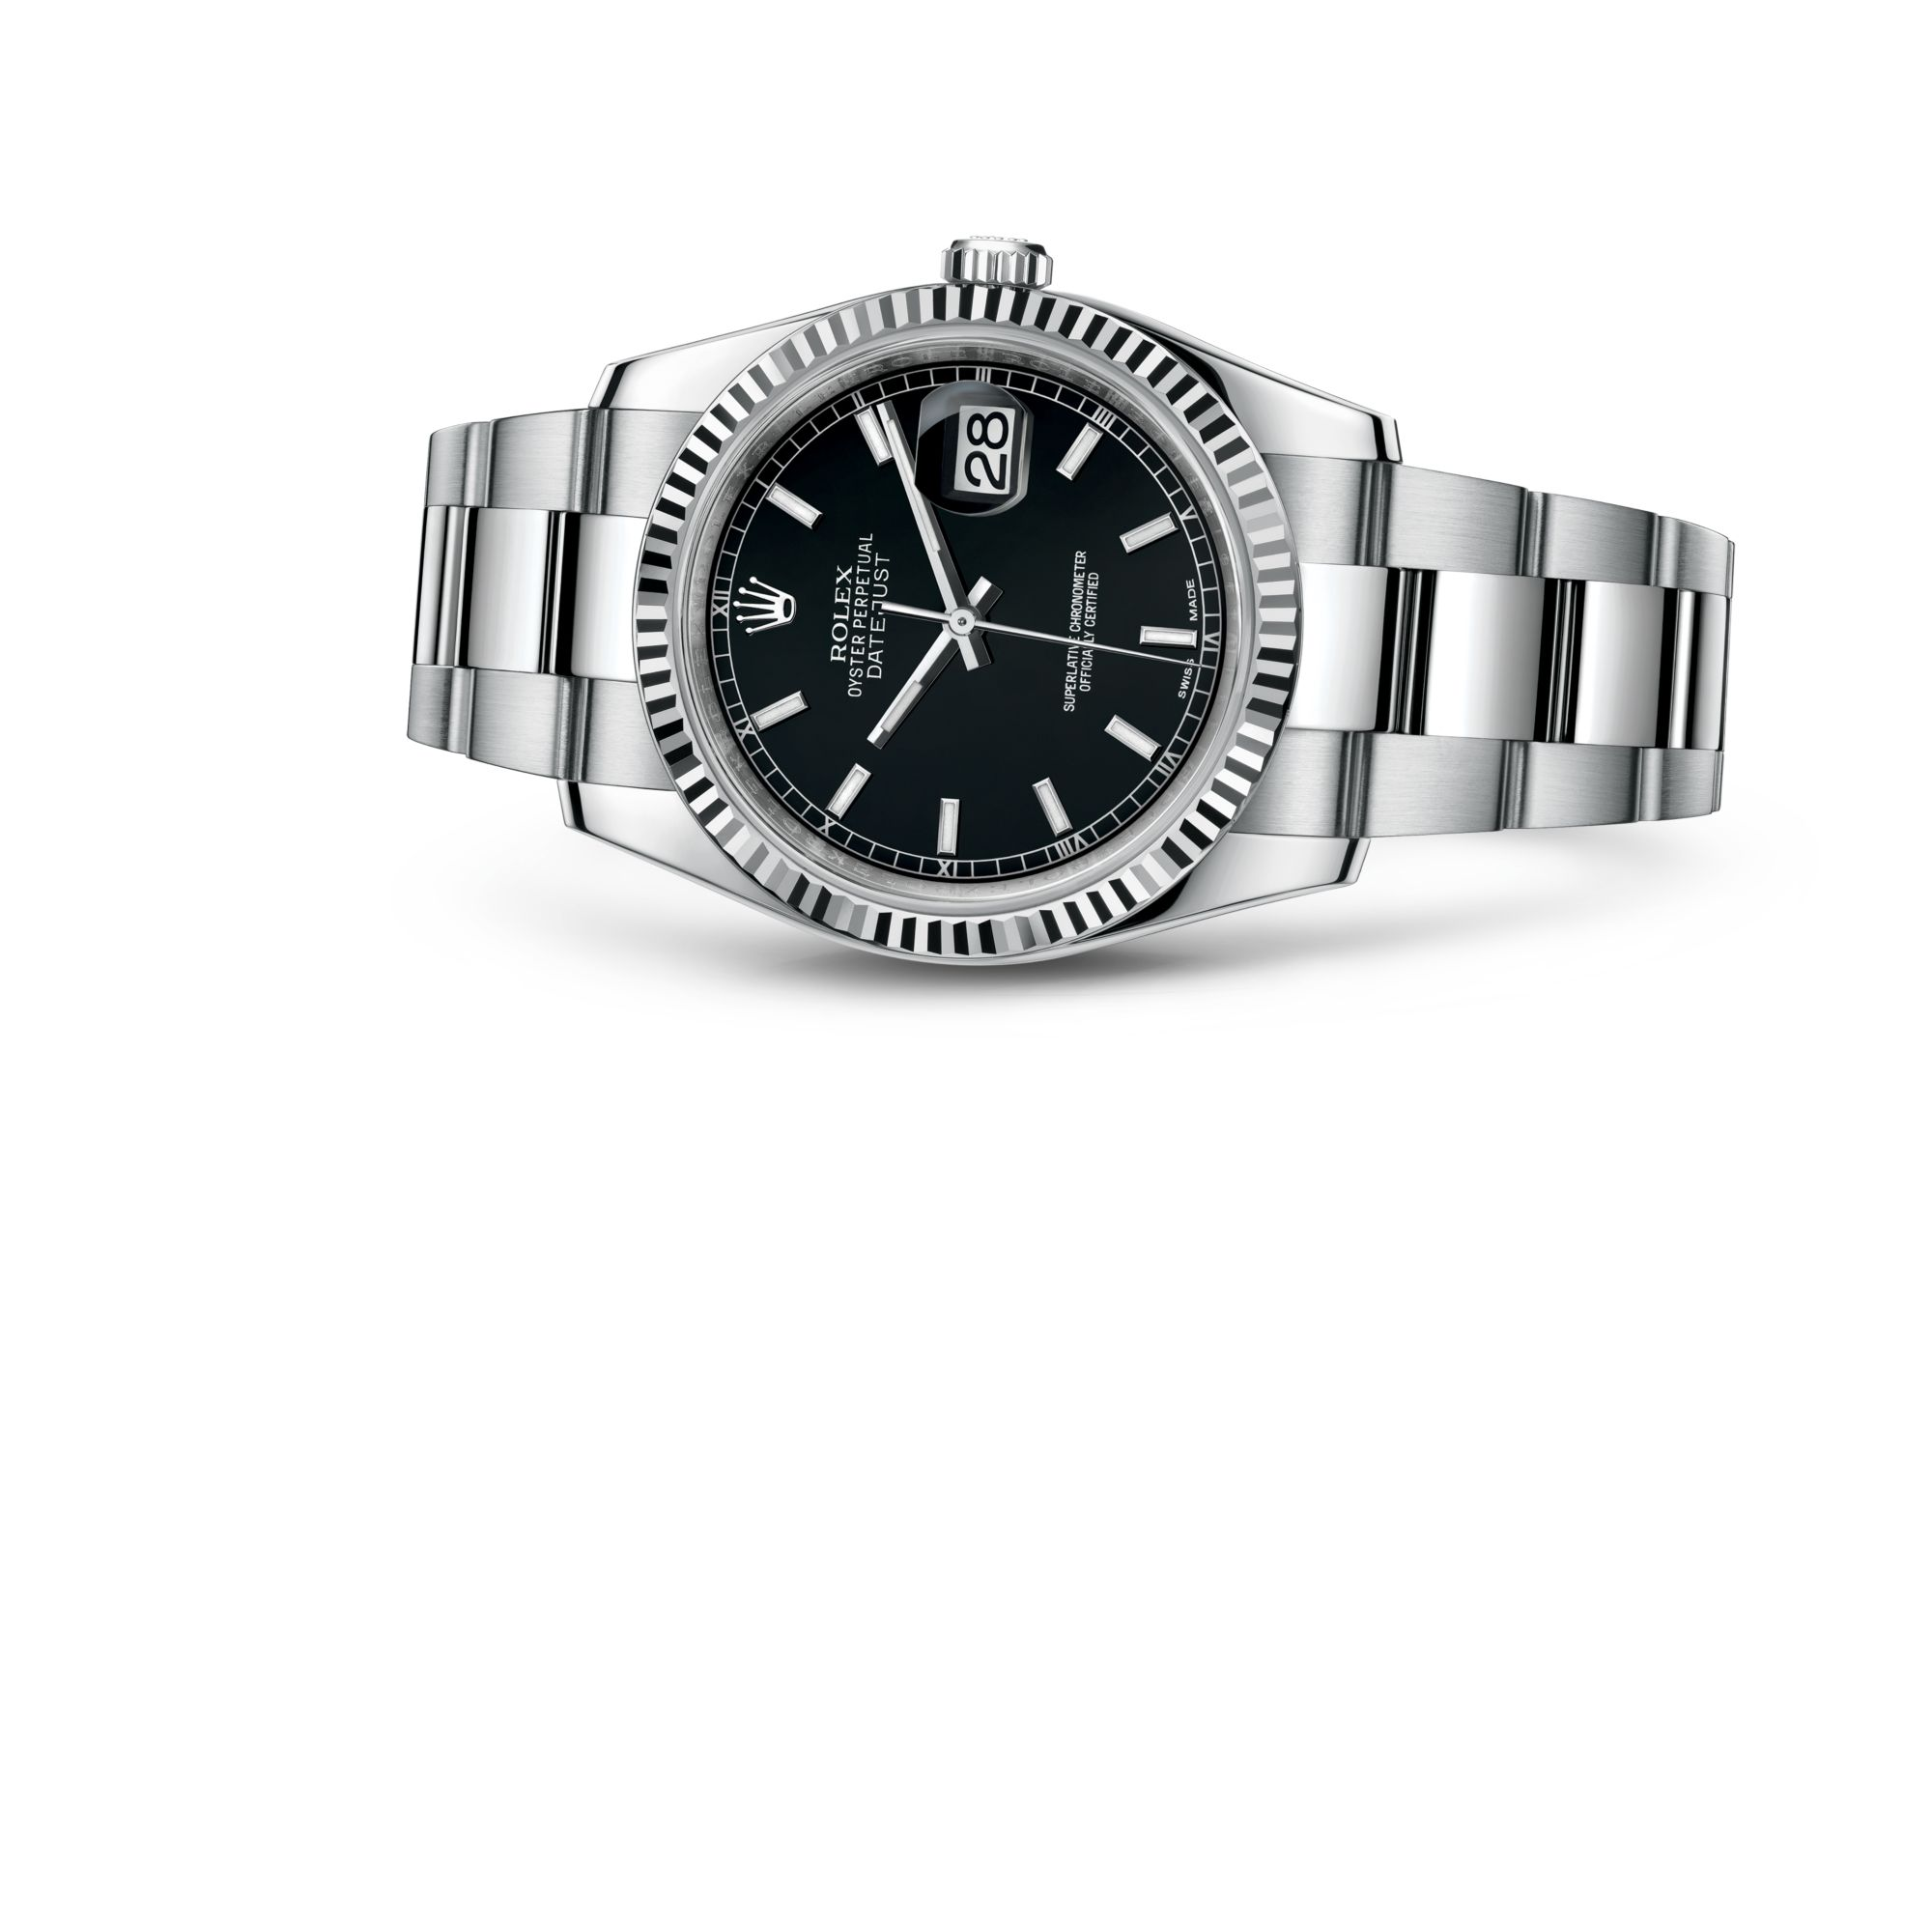 Rolex ديت جست ۳٦ M116234-0091